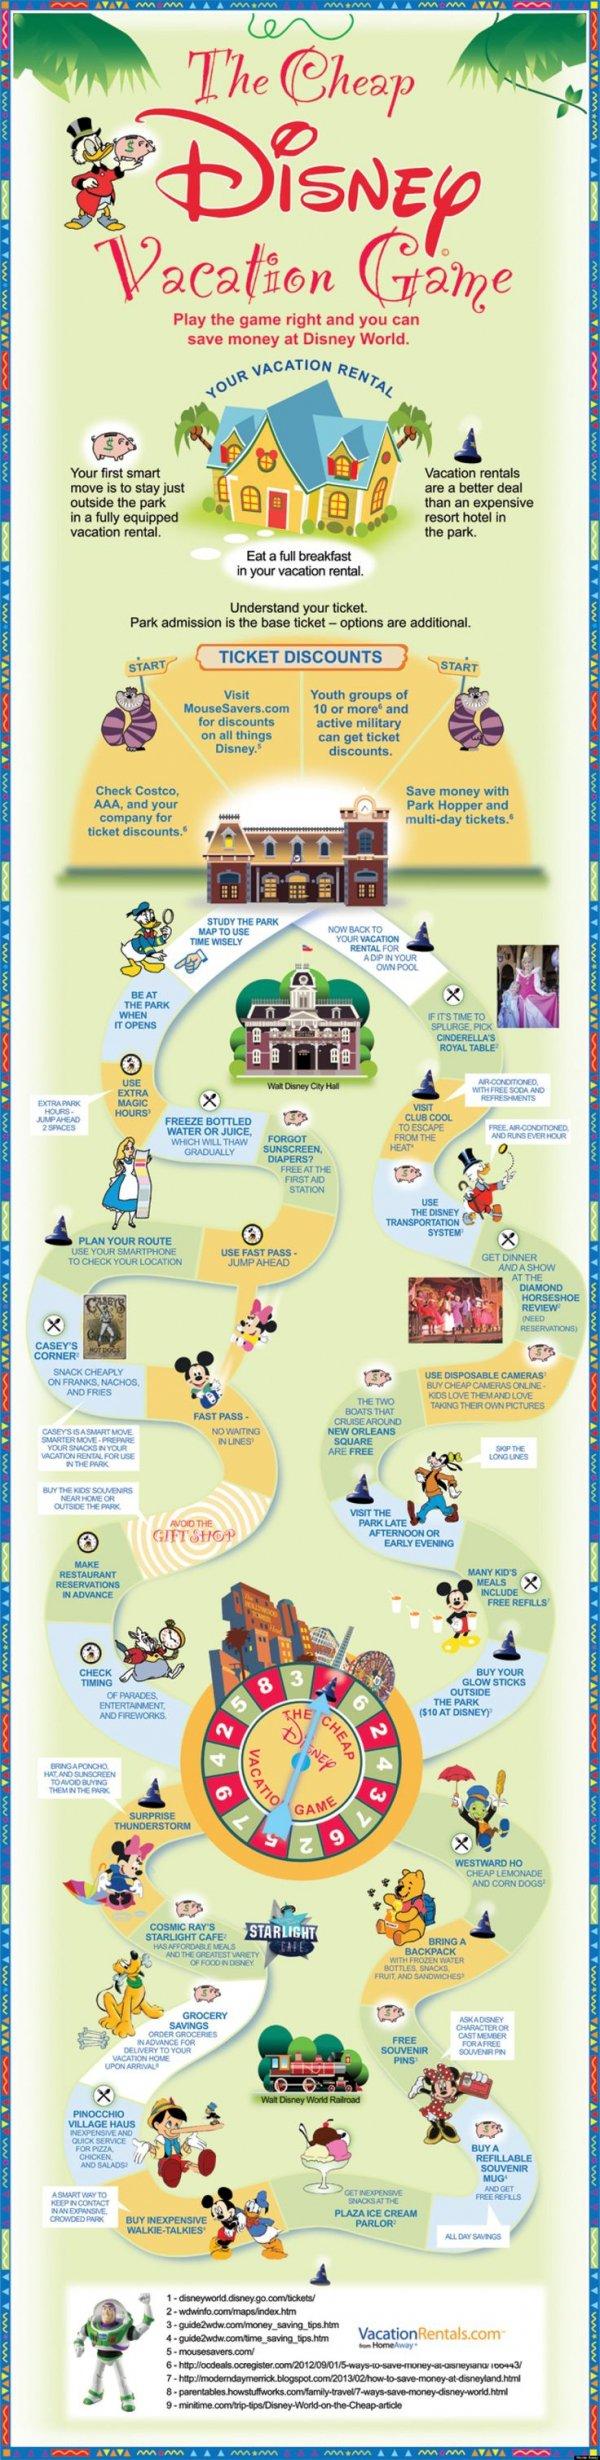 Disneyland Paris,advertising,The,Cheap,Vacation,